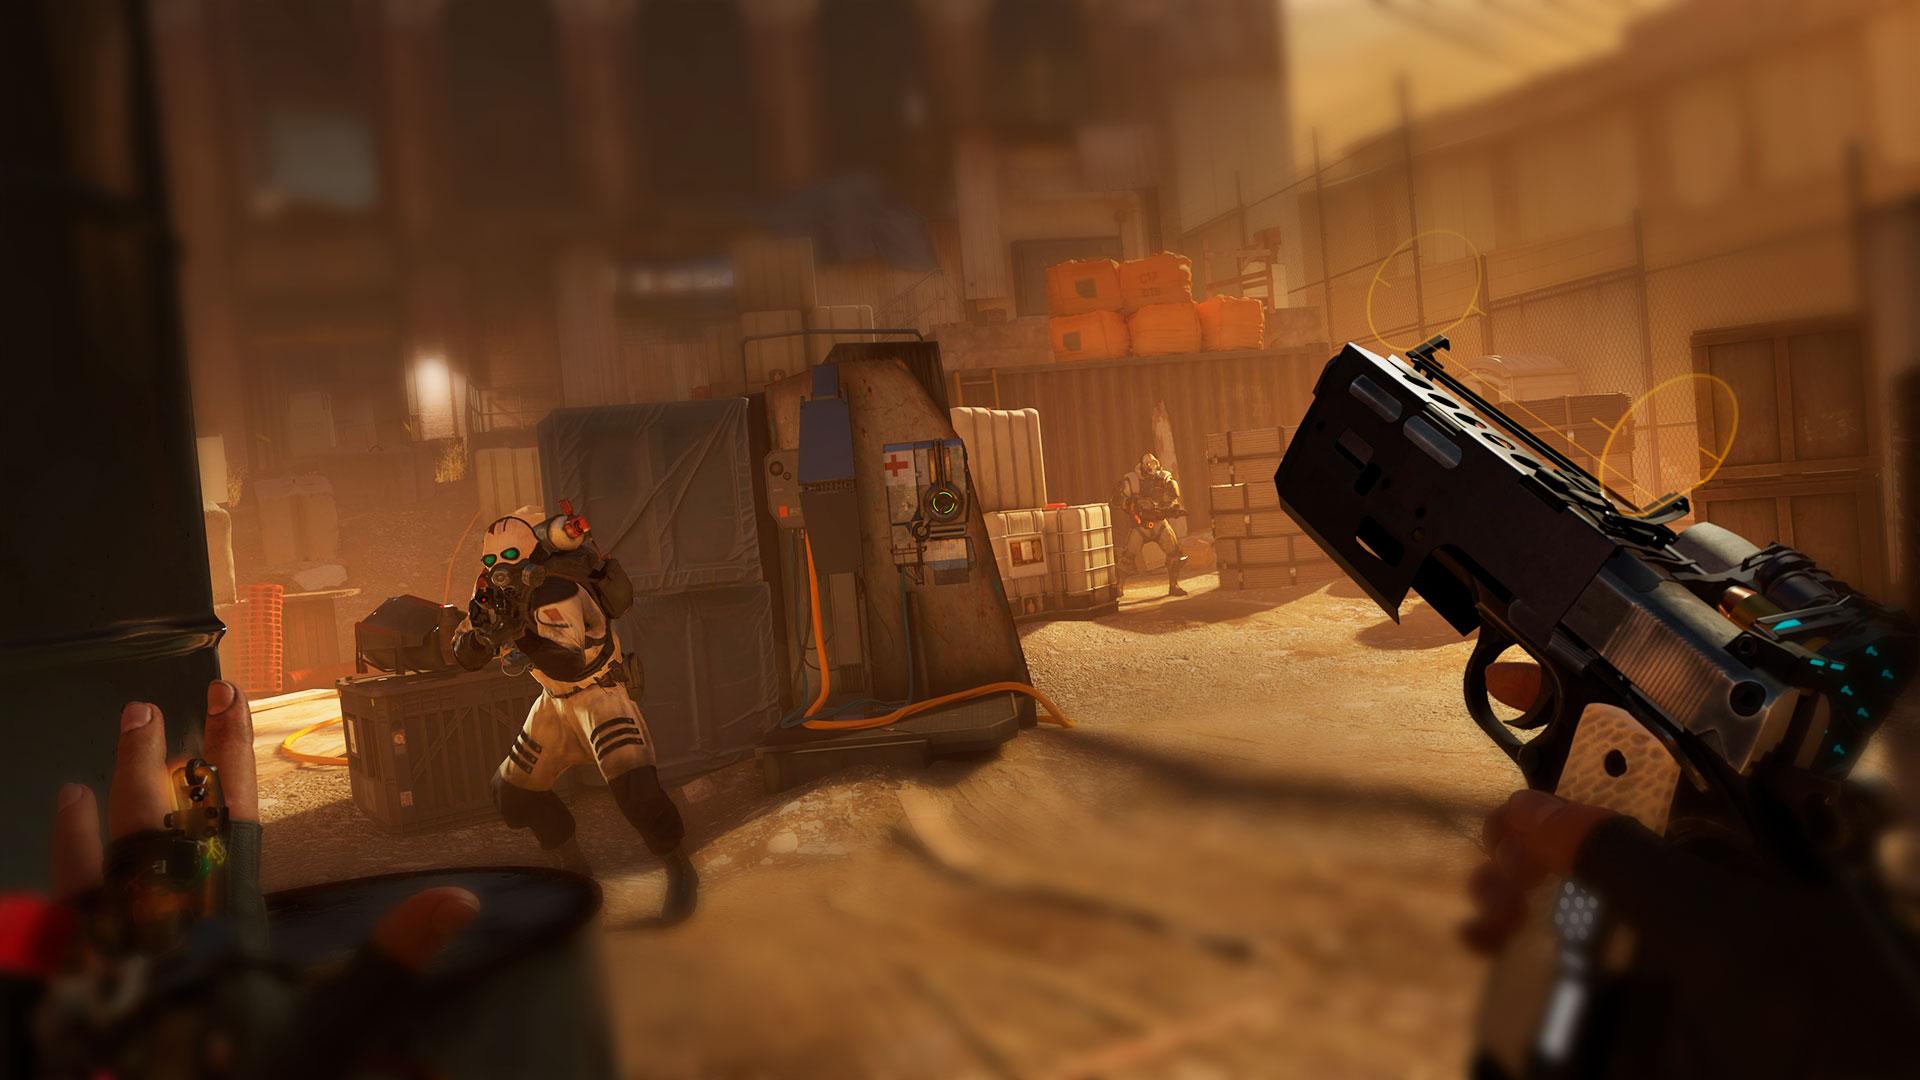 Half-Life action-shooter